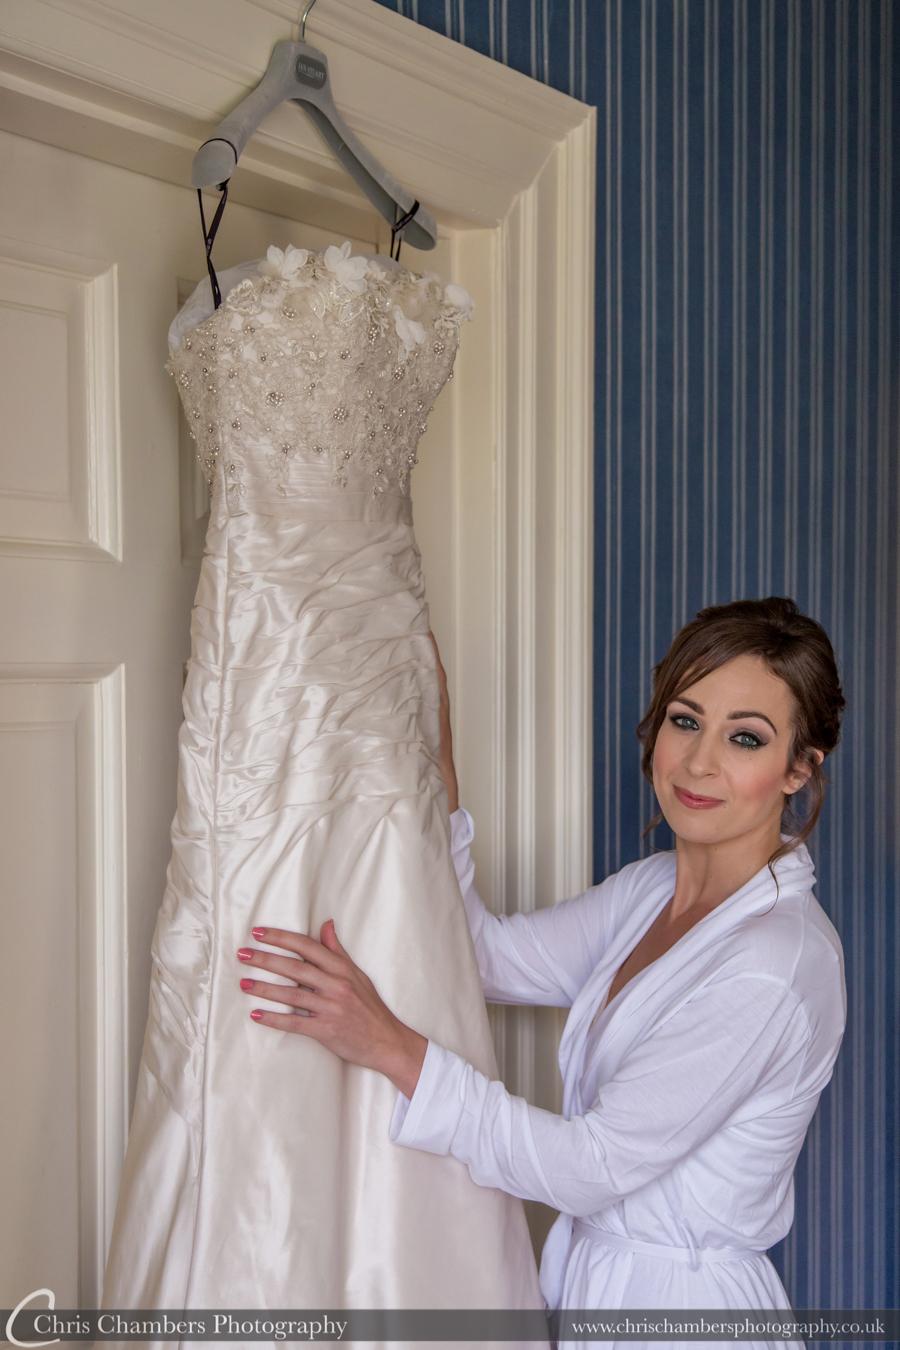 Award winning wedding photography at Swinton Park